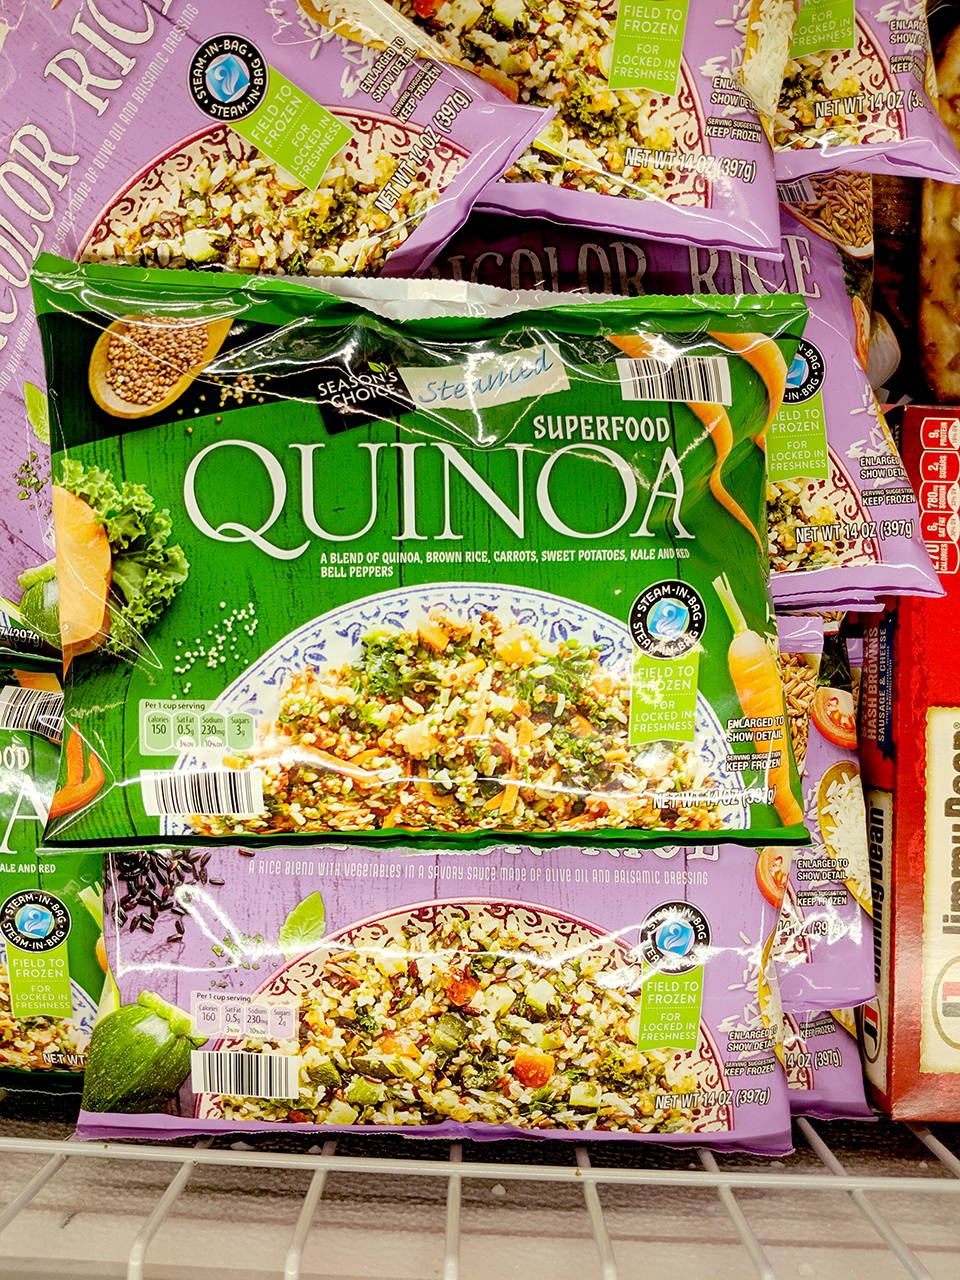 JodiLoves-Aldi-Superfood-Quinoa-5-Points.jpg